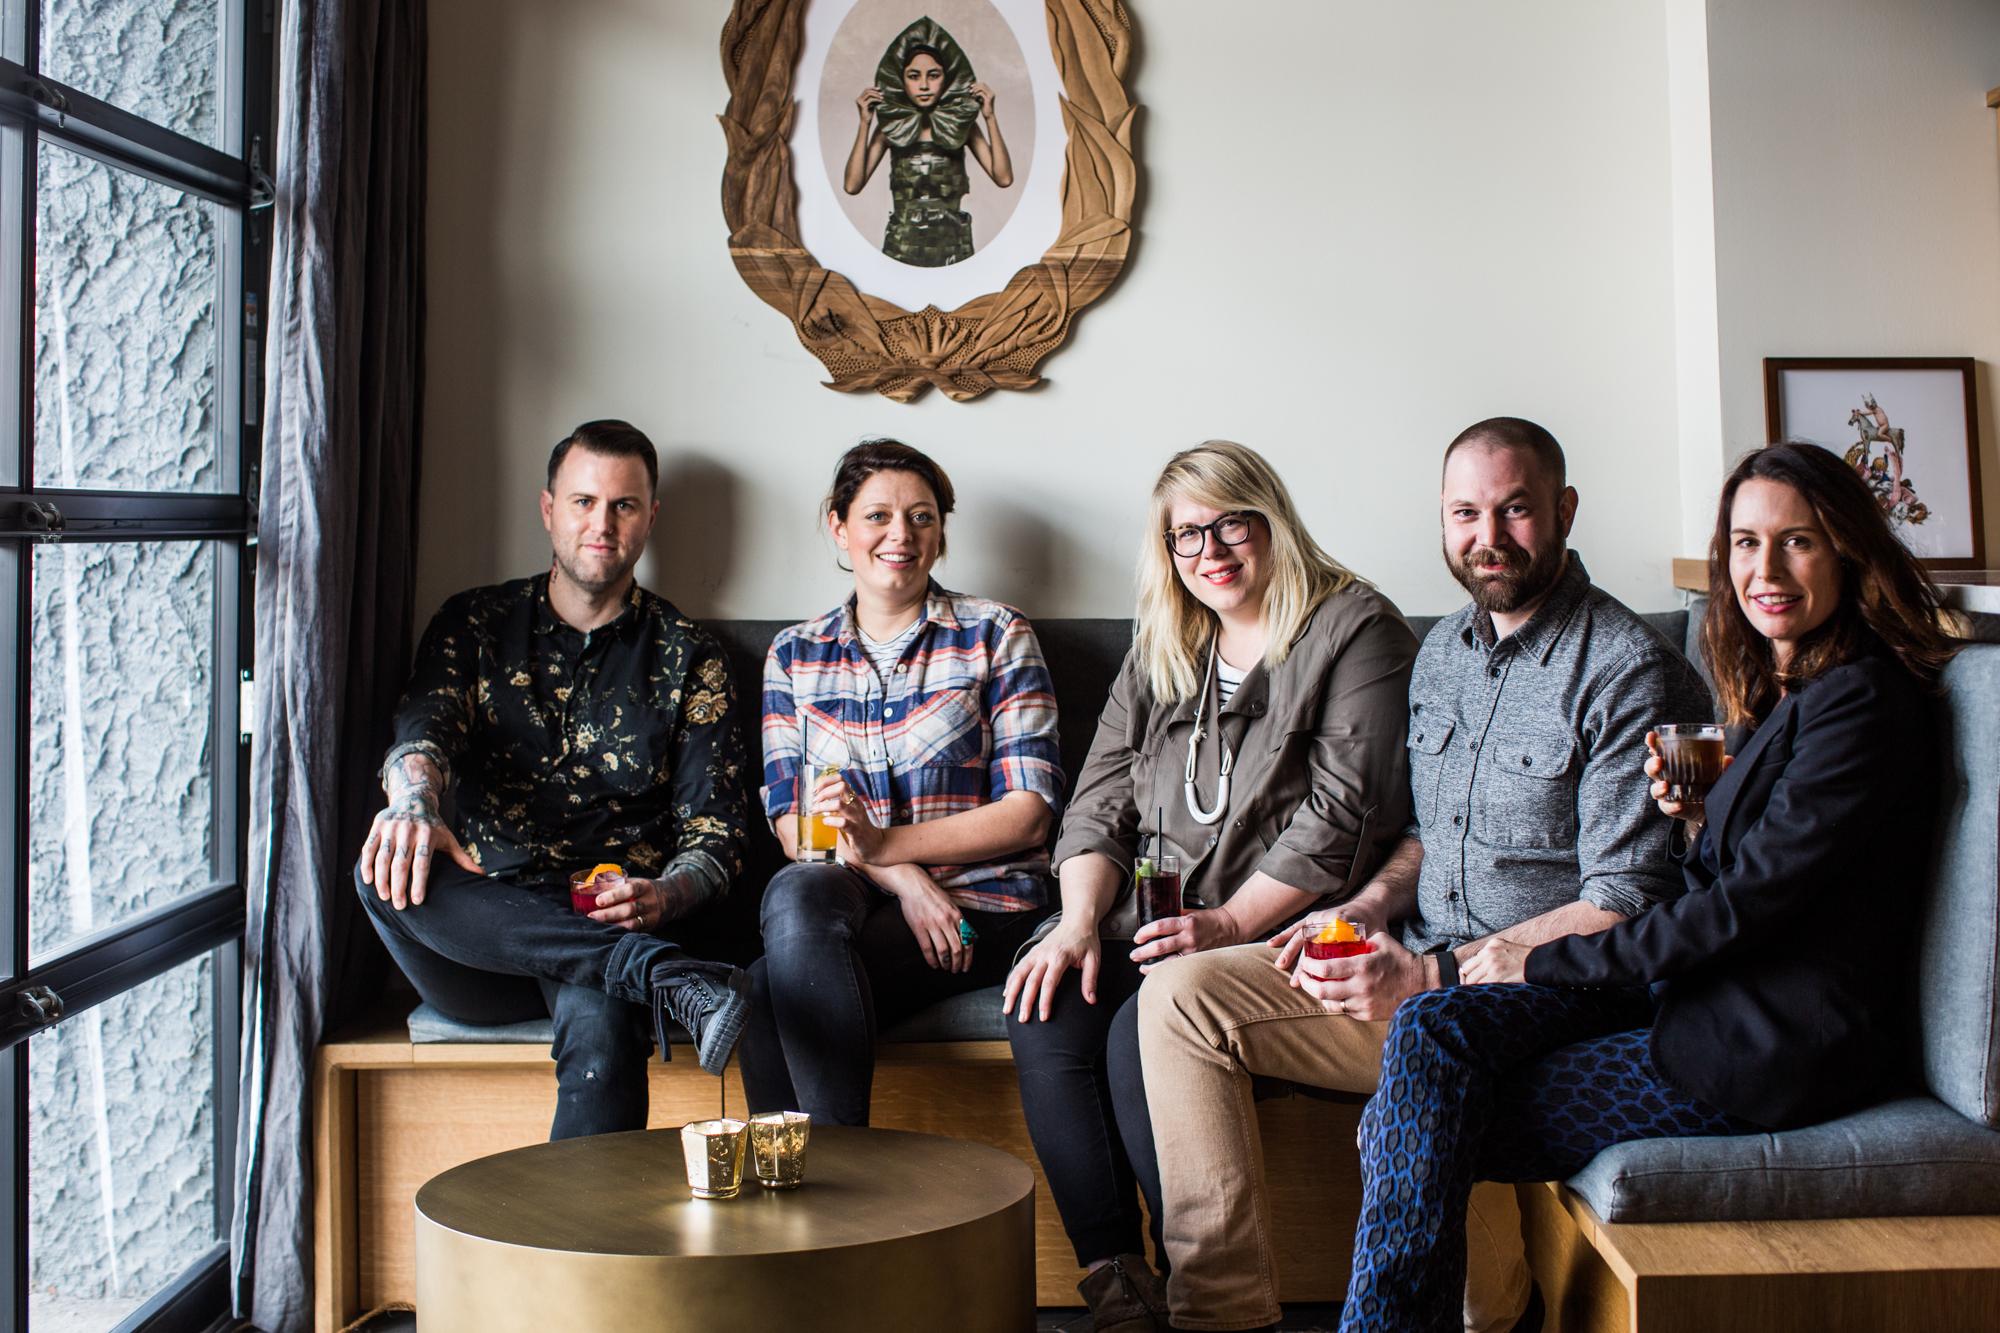 From left: Freddy Schwenk, Abi Hewitt, Katie Vance, Matt Alexander and Nealy Glenn.